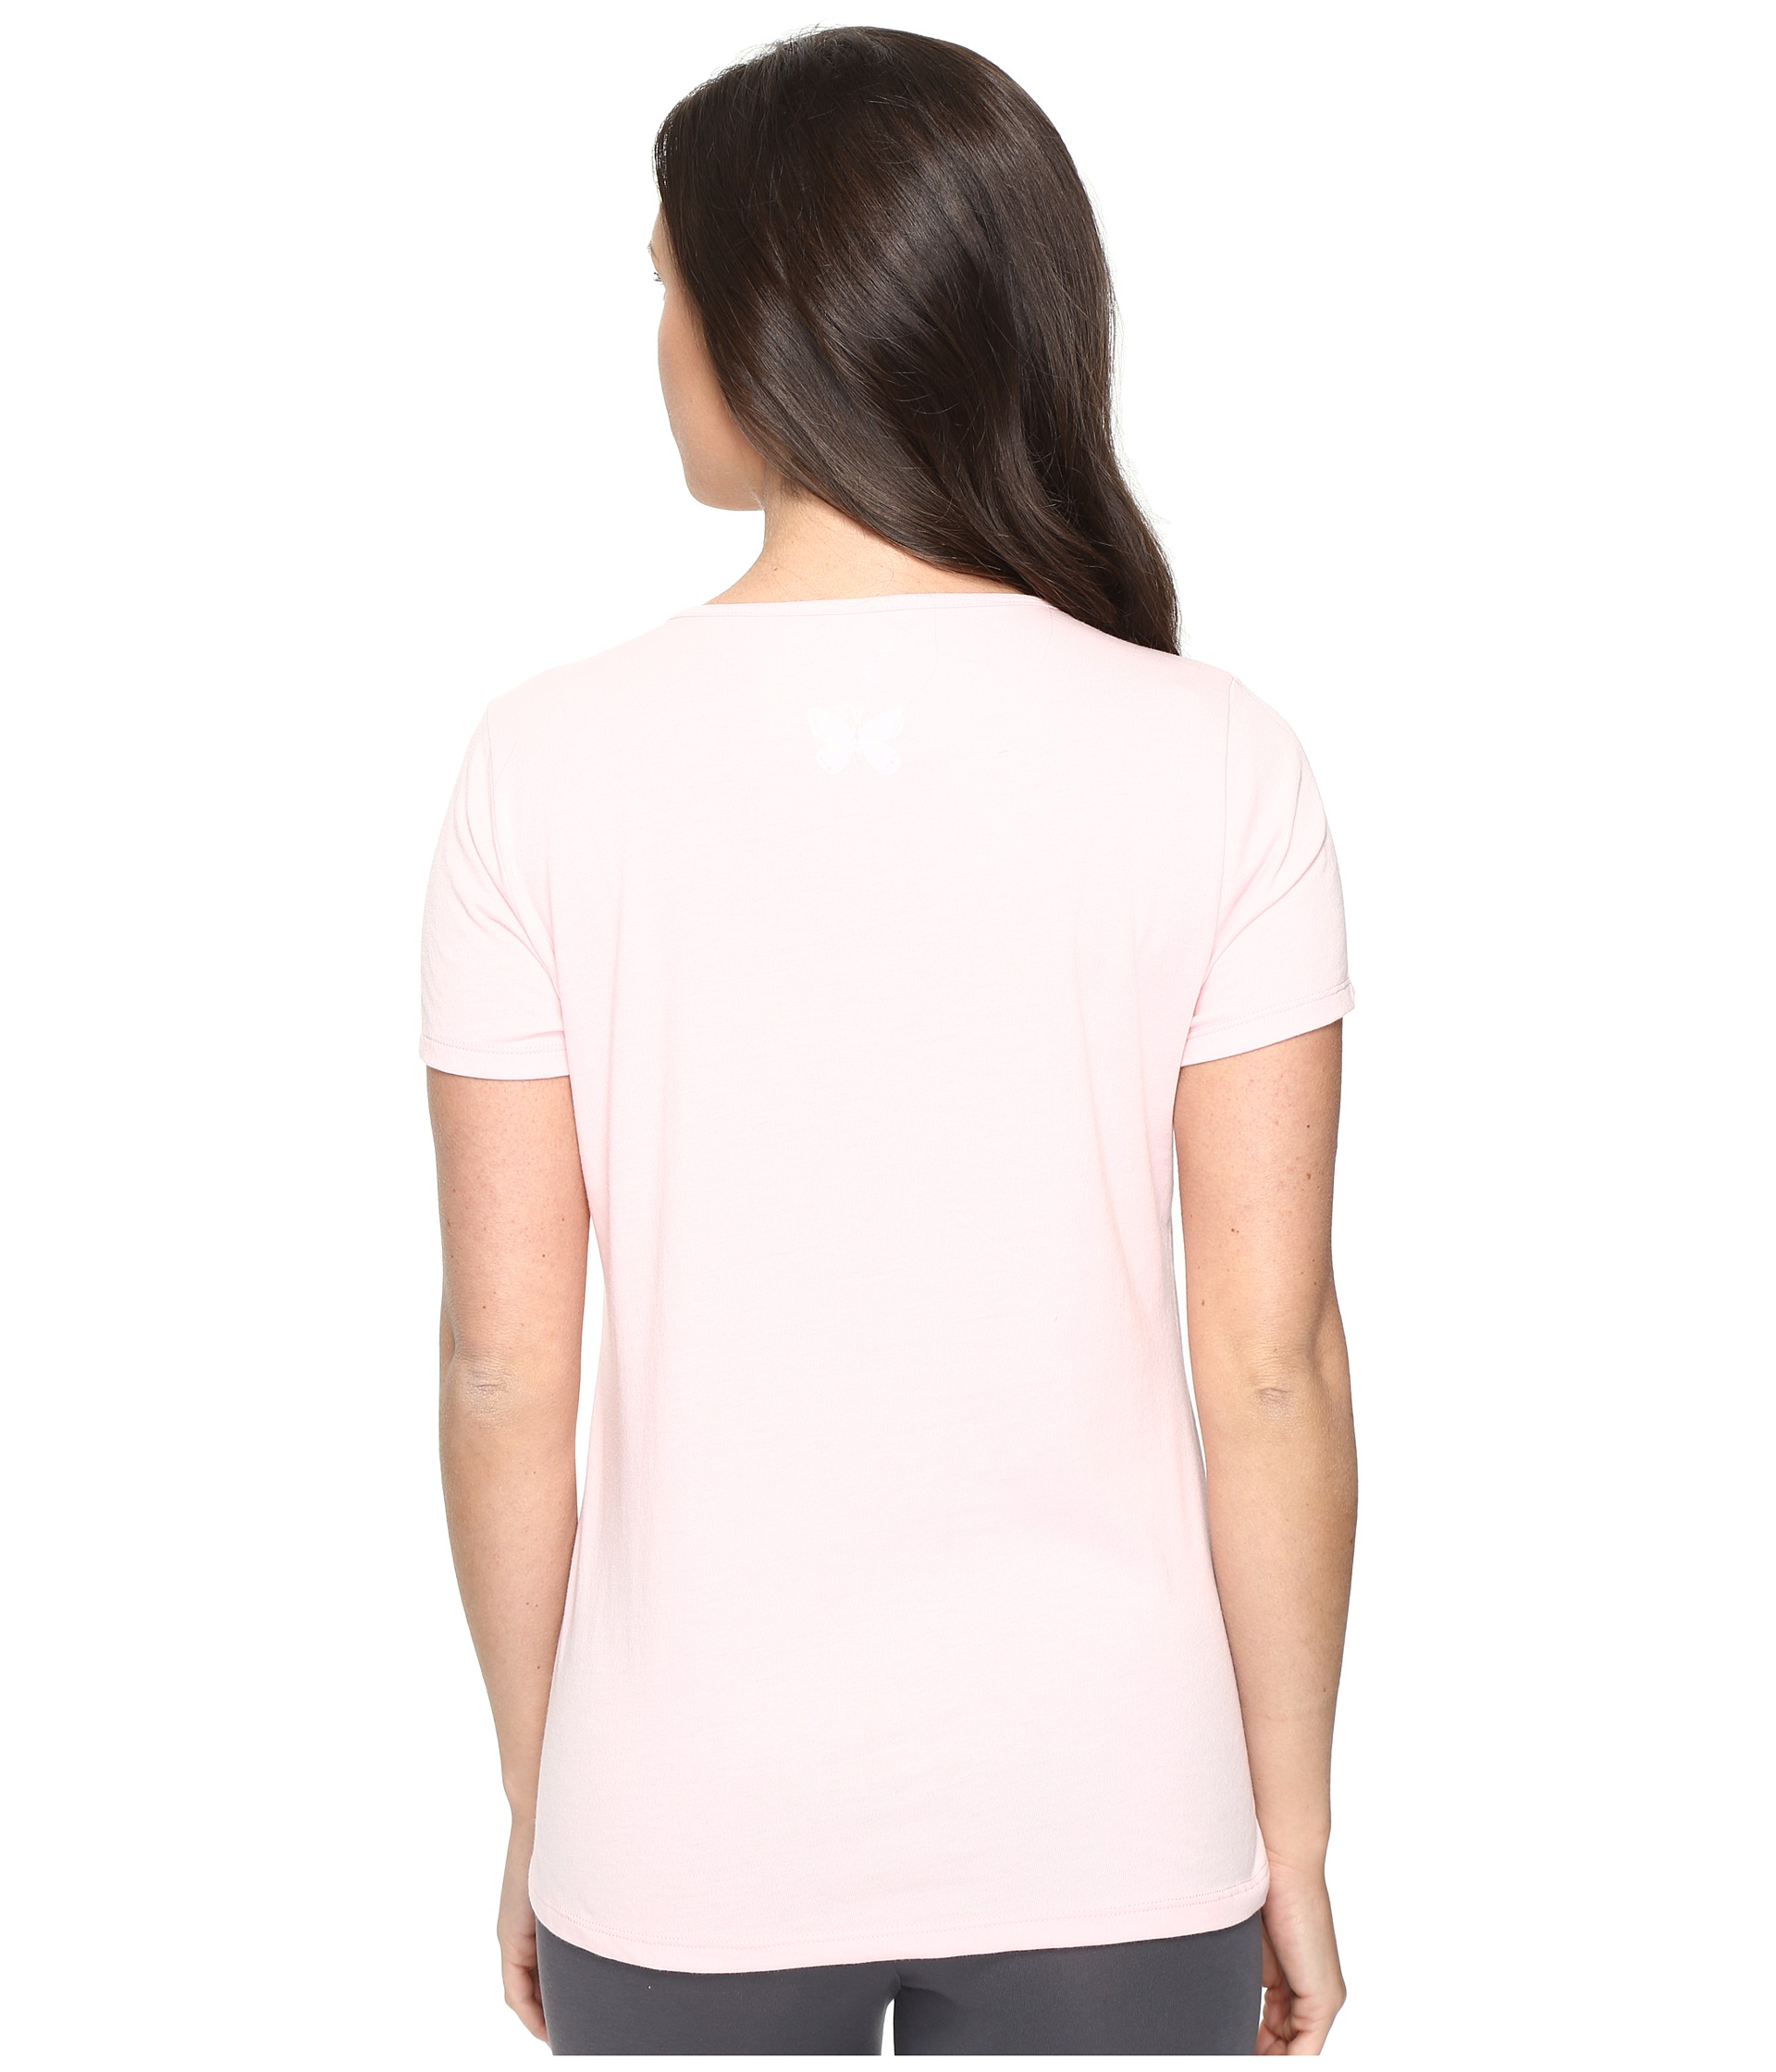 Jockey short sleeve tee free shipping both ways for Jockey t shirts sale